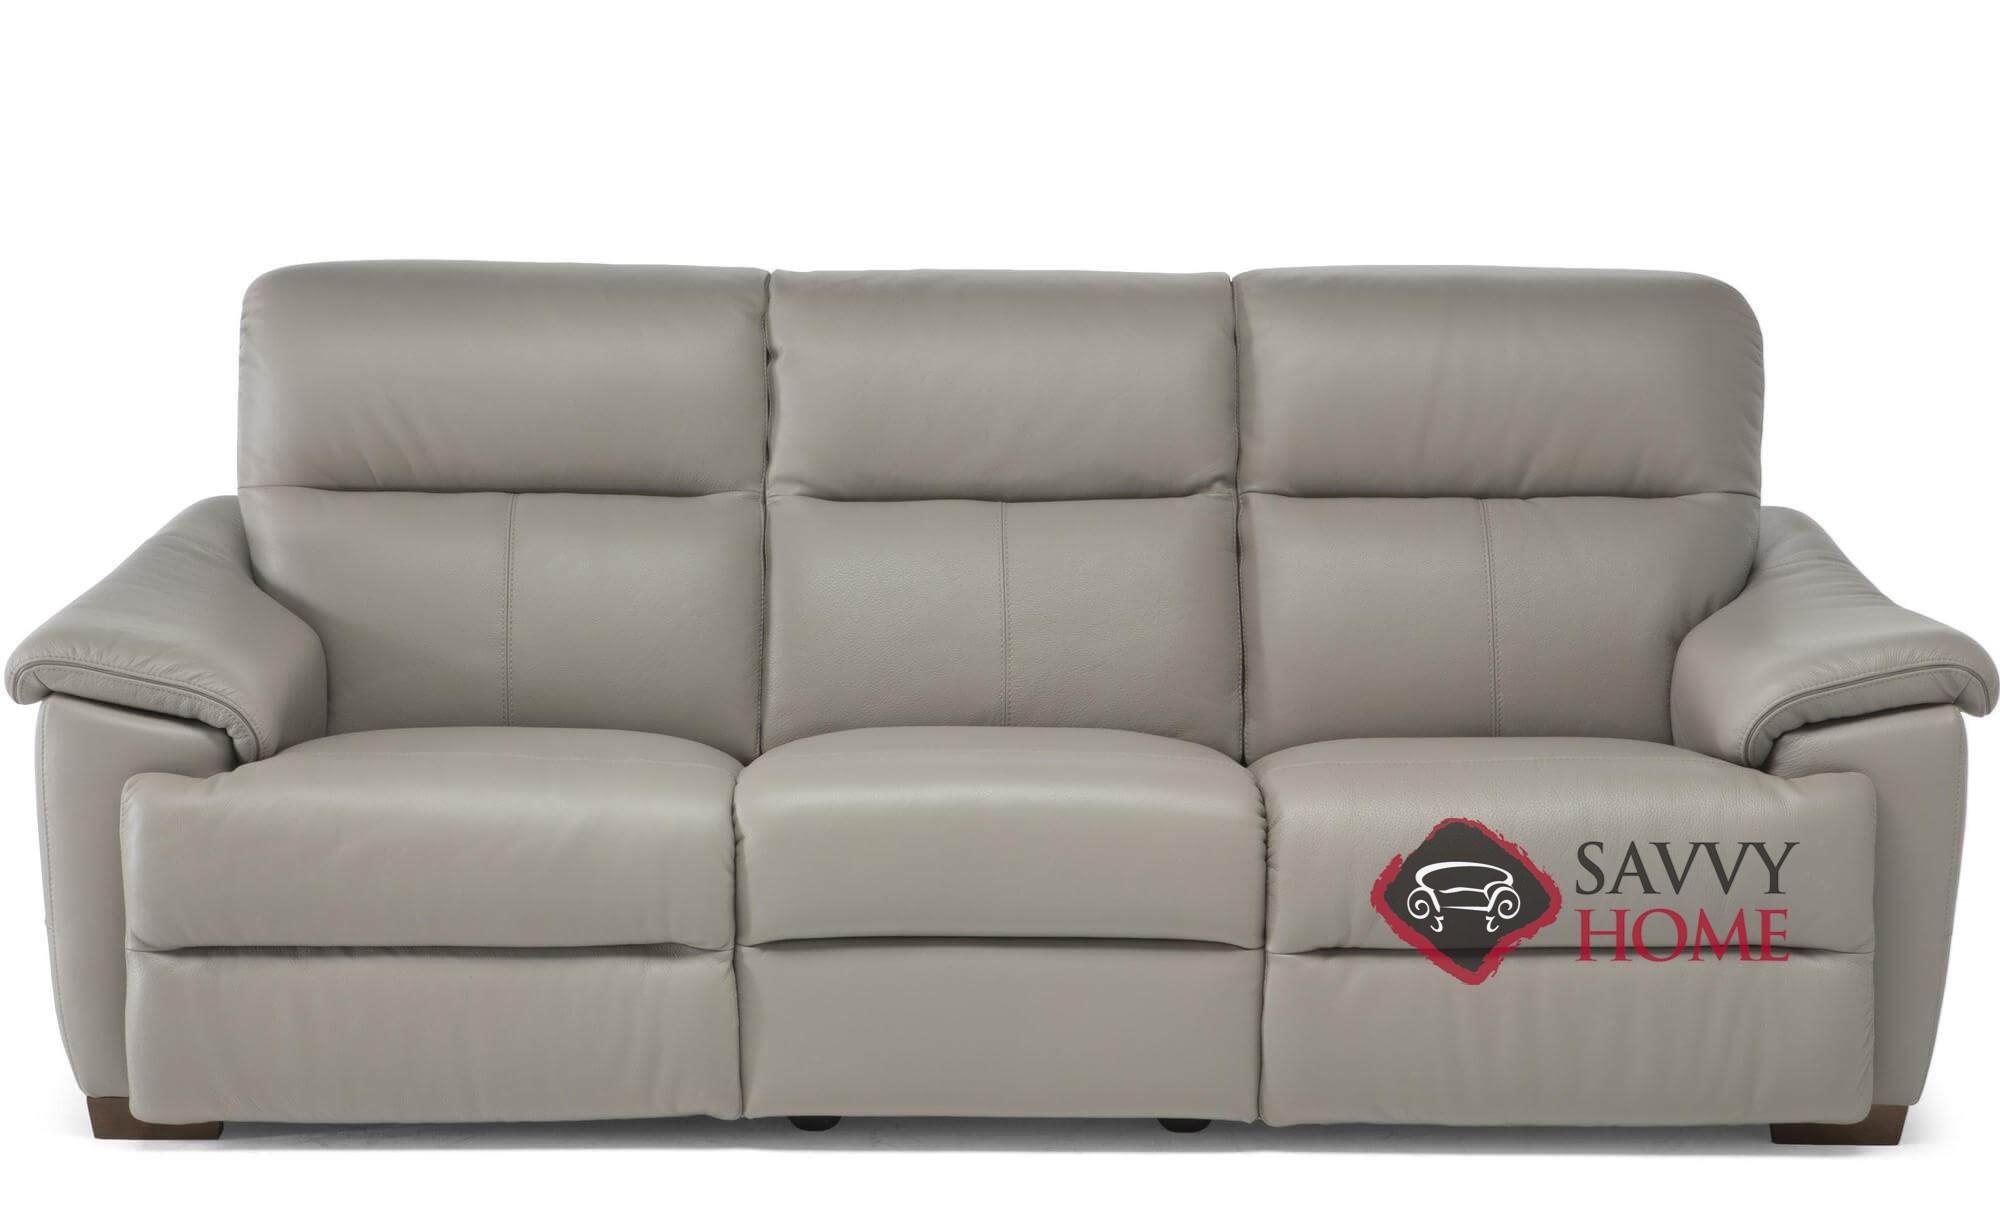 Potenza C063 N55 Power Reclining Leather Large Sofa By Natuzzi